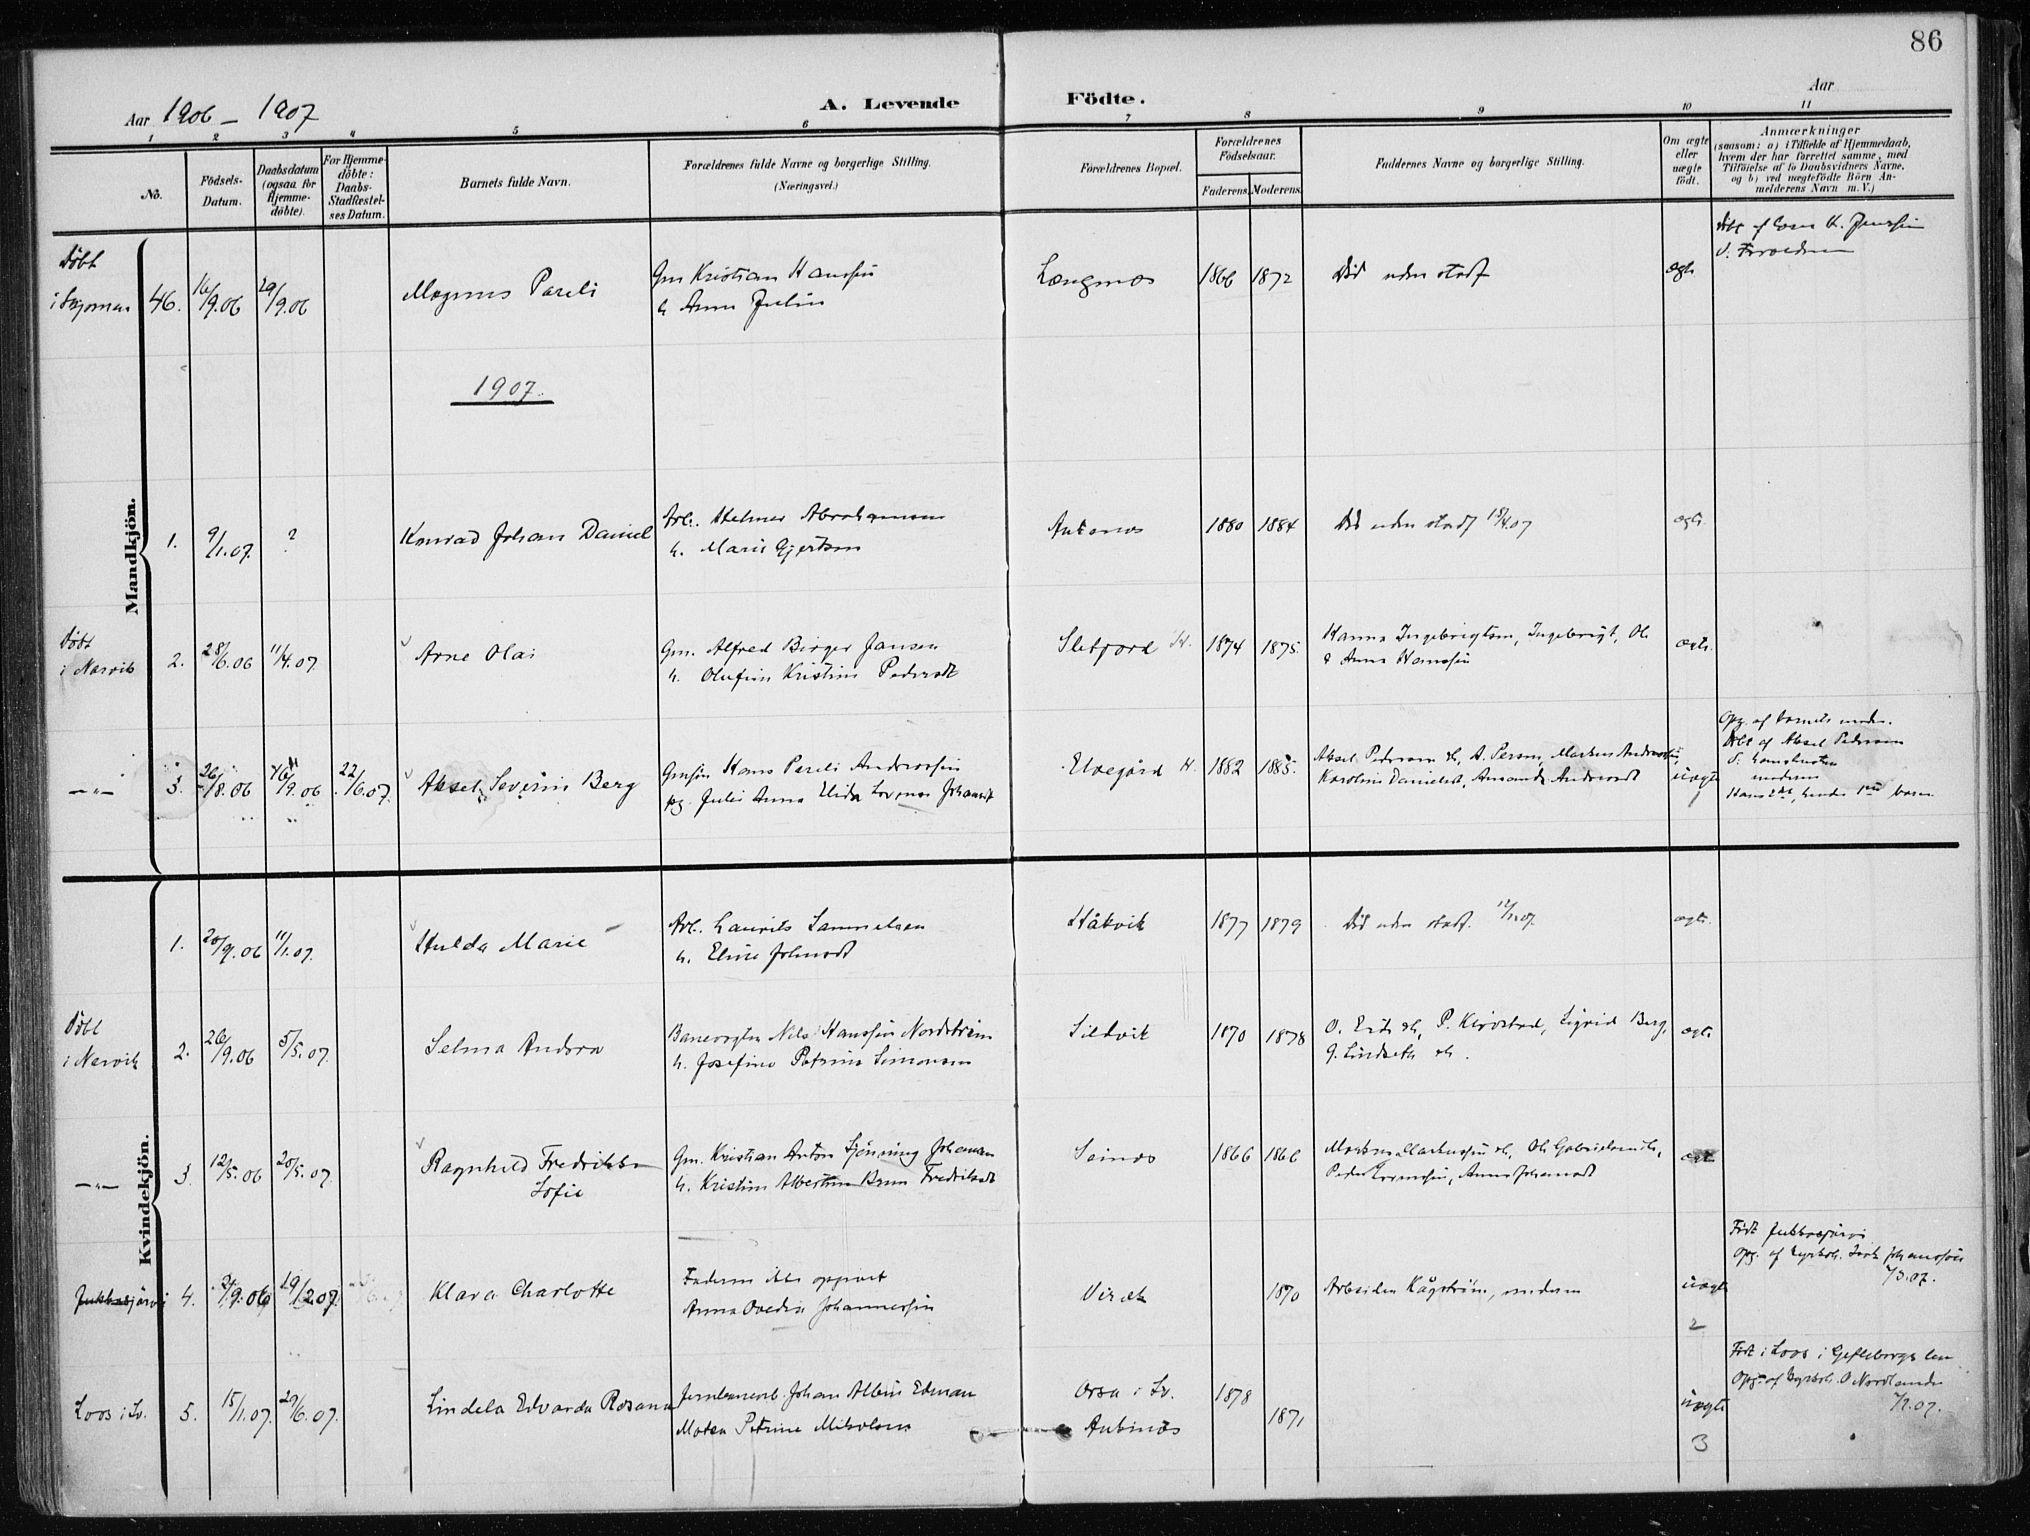 SAT, Ministerialprotokoller, klokkerbøker og fødselsregistre - Nordland, 866/L0941: Ministerialbok nr. 866A04, 1901-1917, s. 86